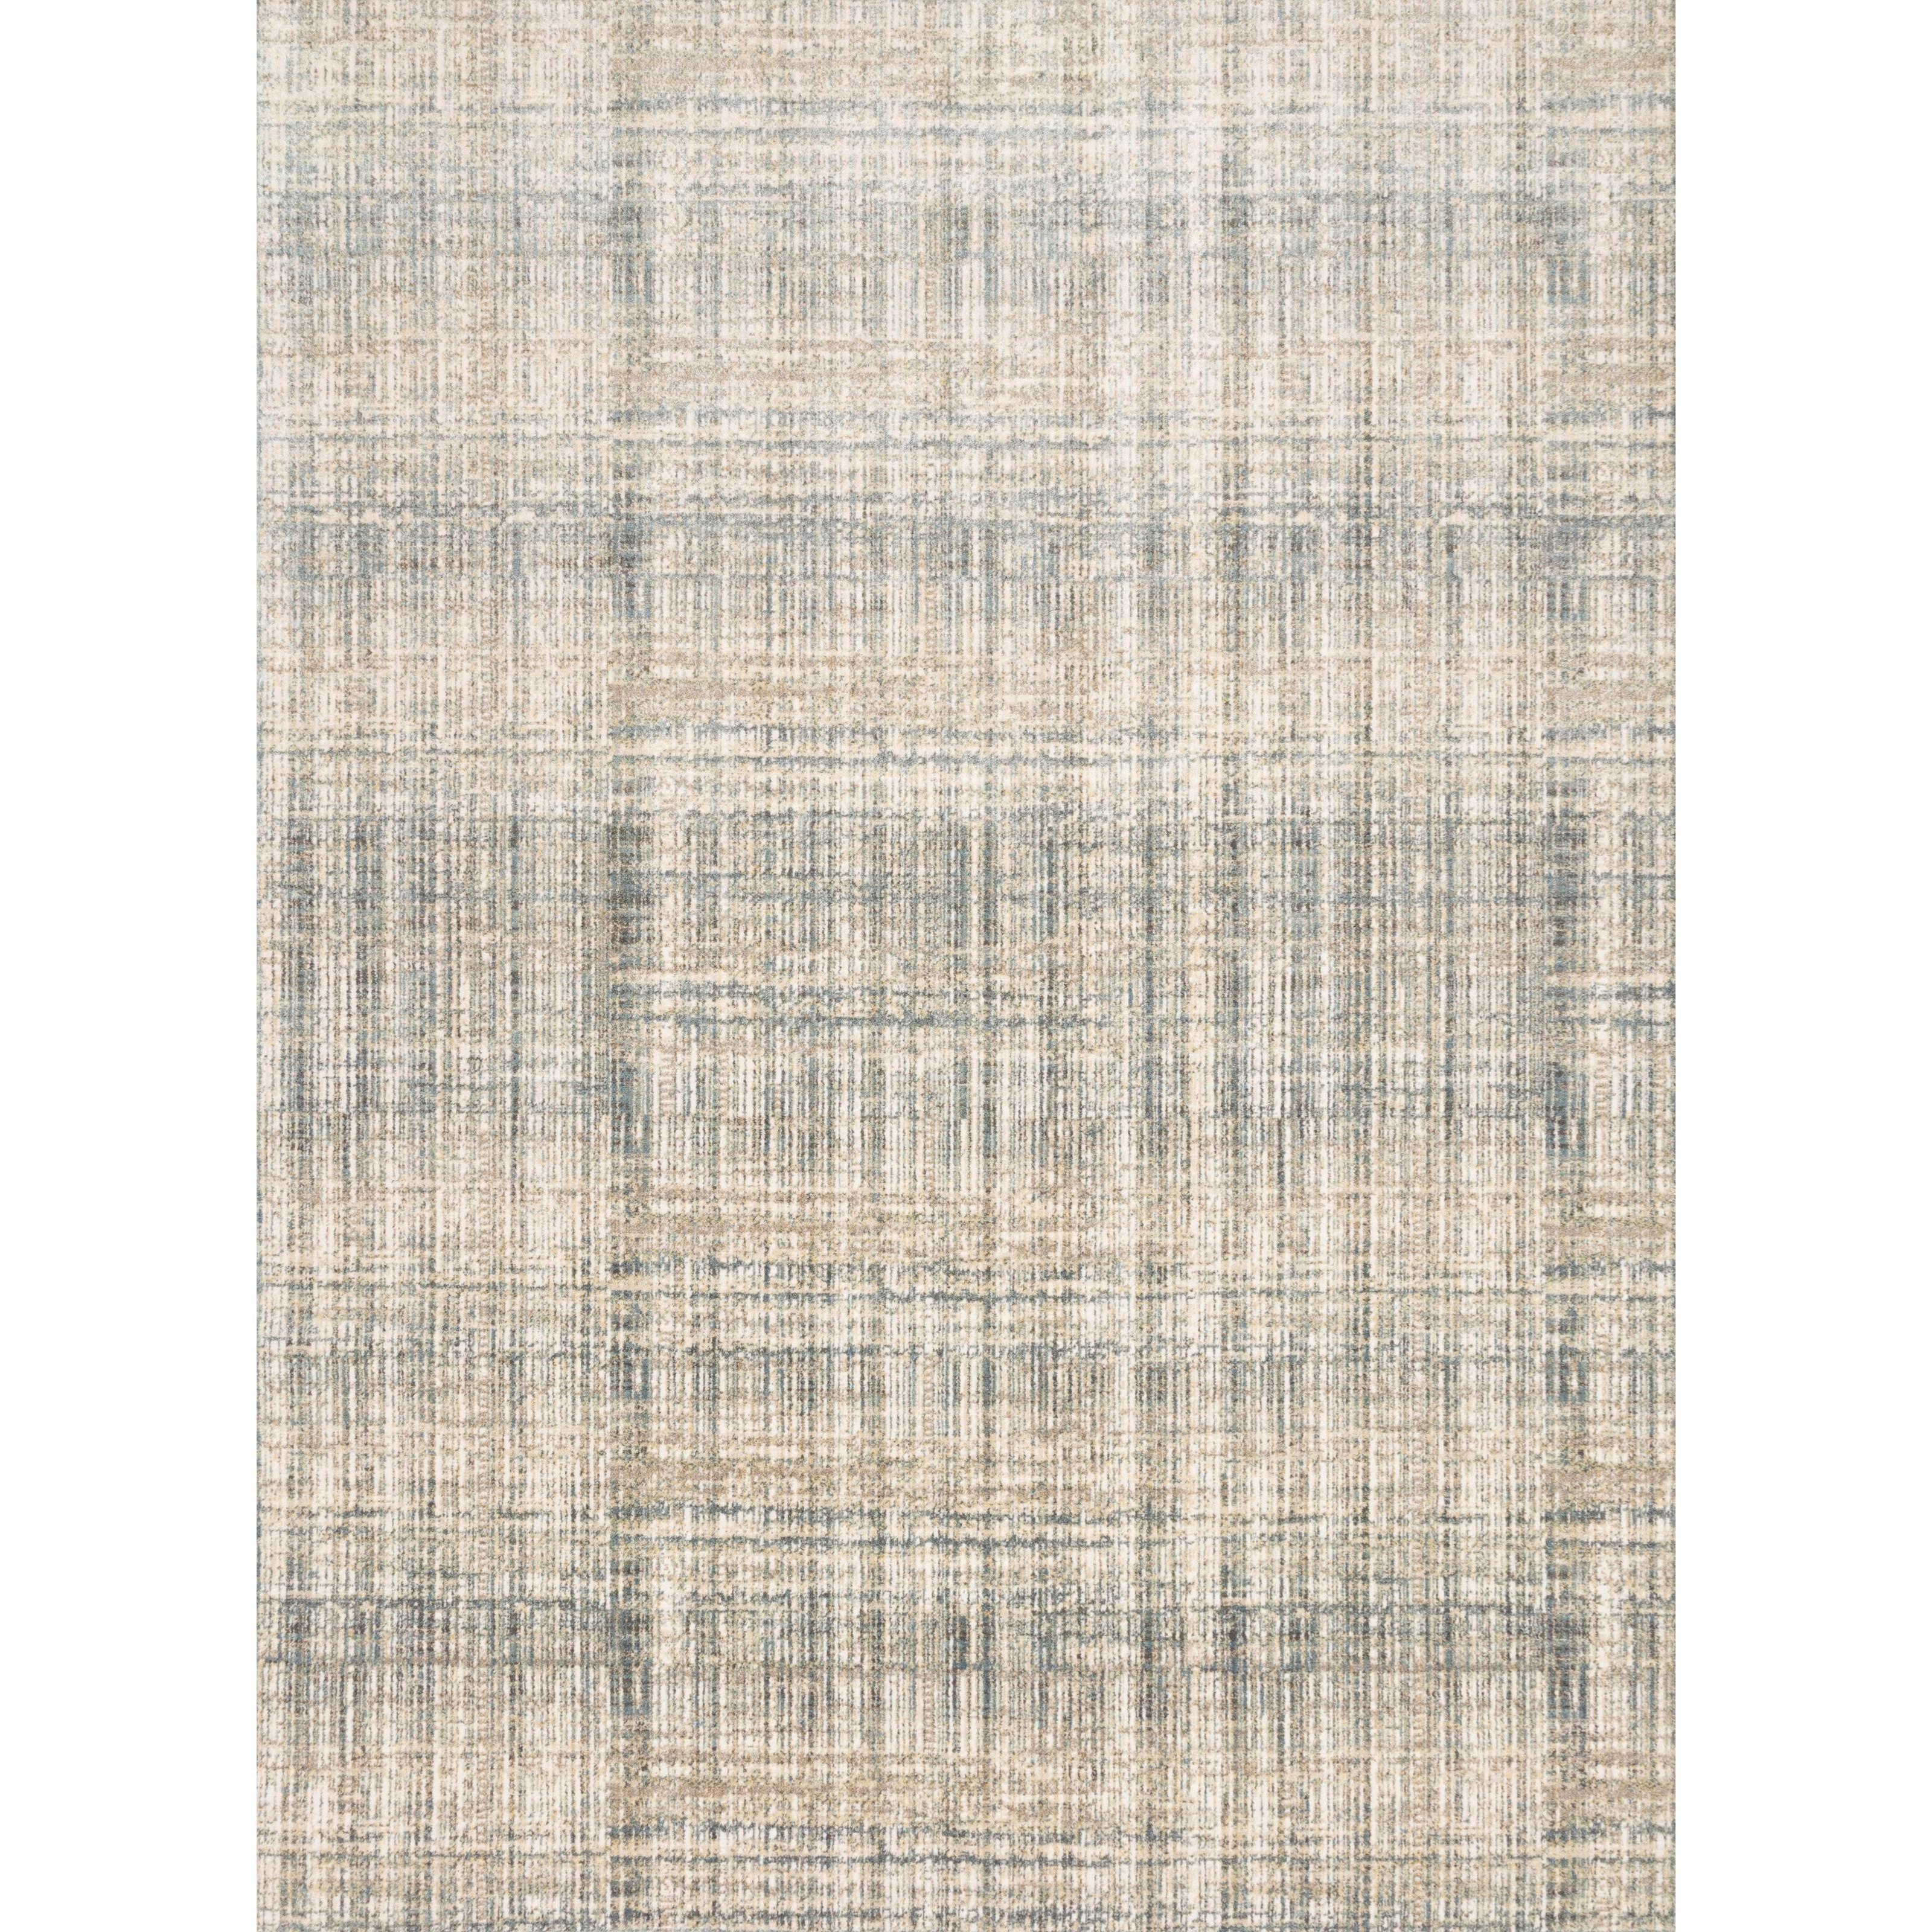 "Reid 2'7"" x 12'0"" Bluestone Rug by Loloi Rugs at Virginia Furniture Market"